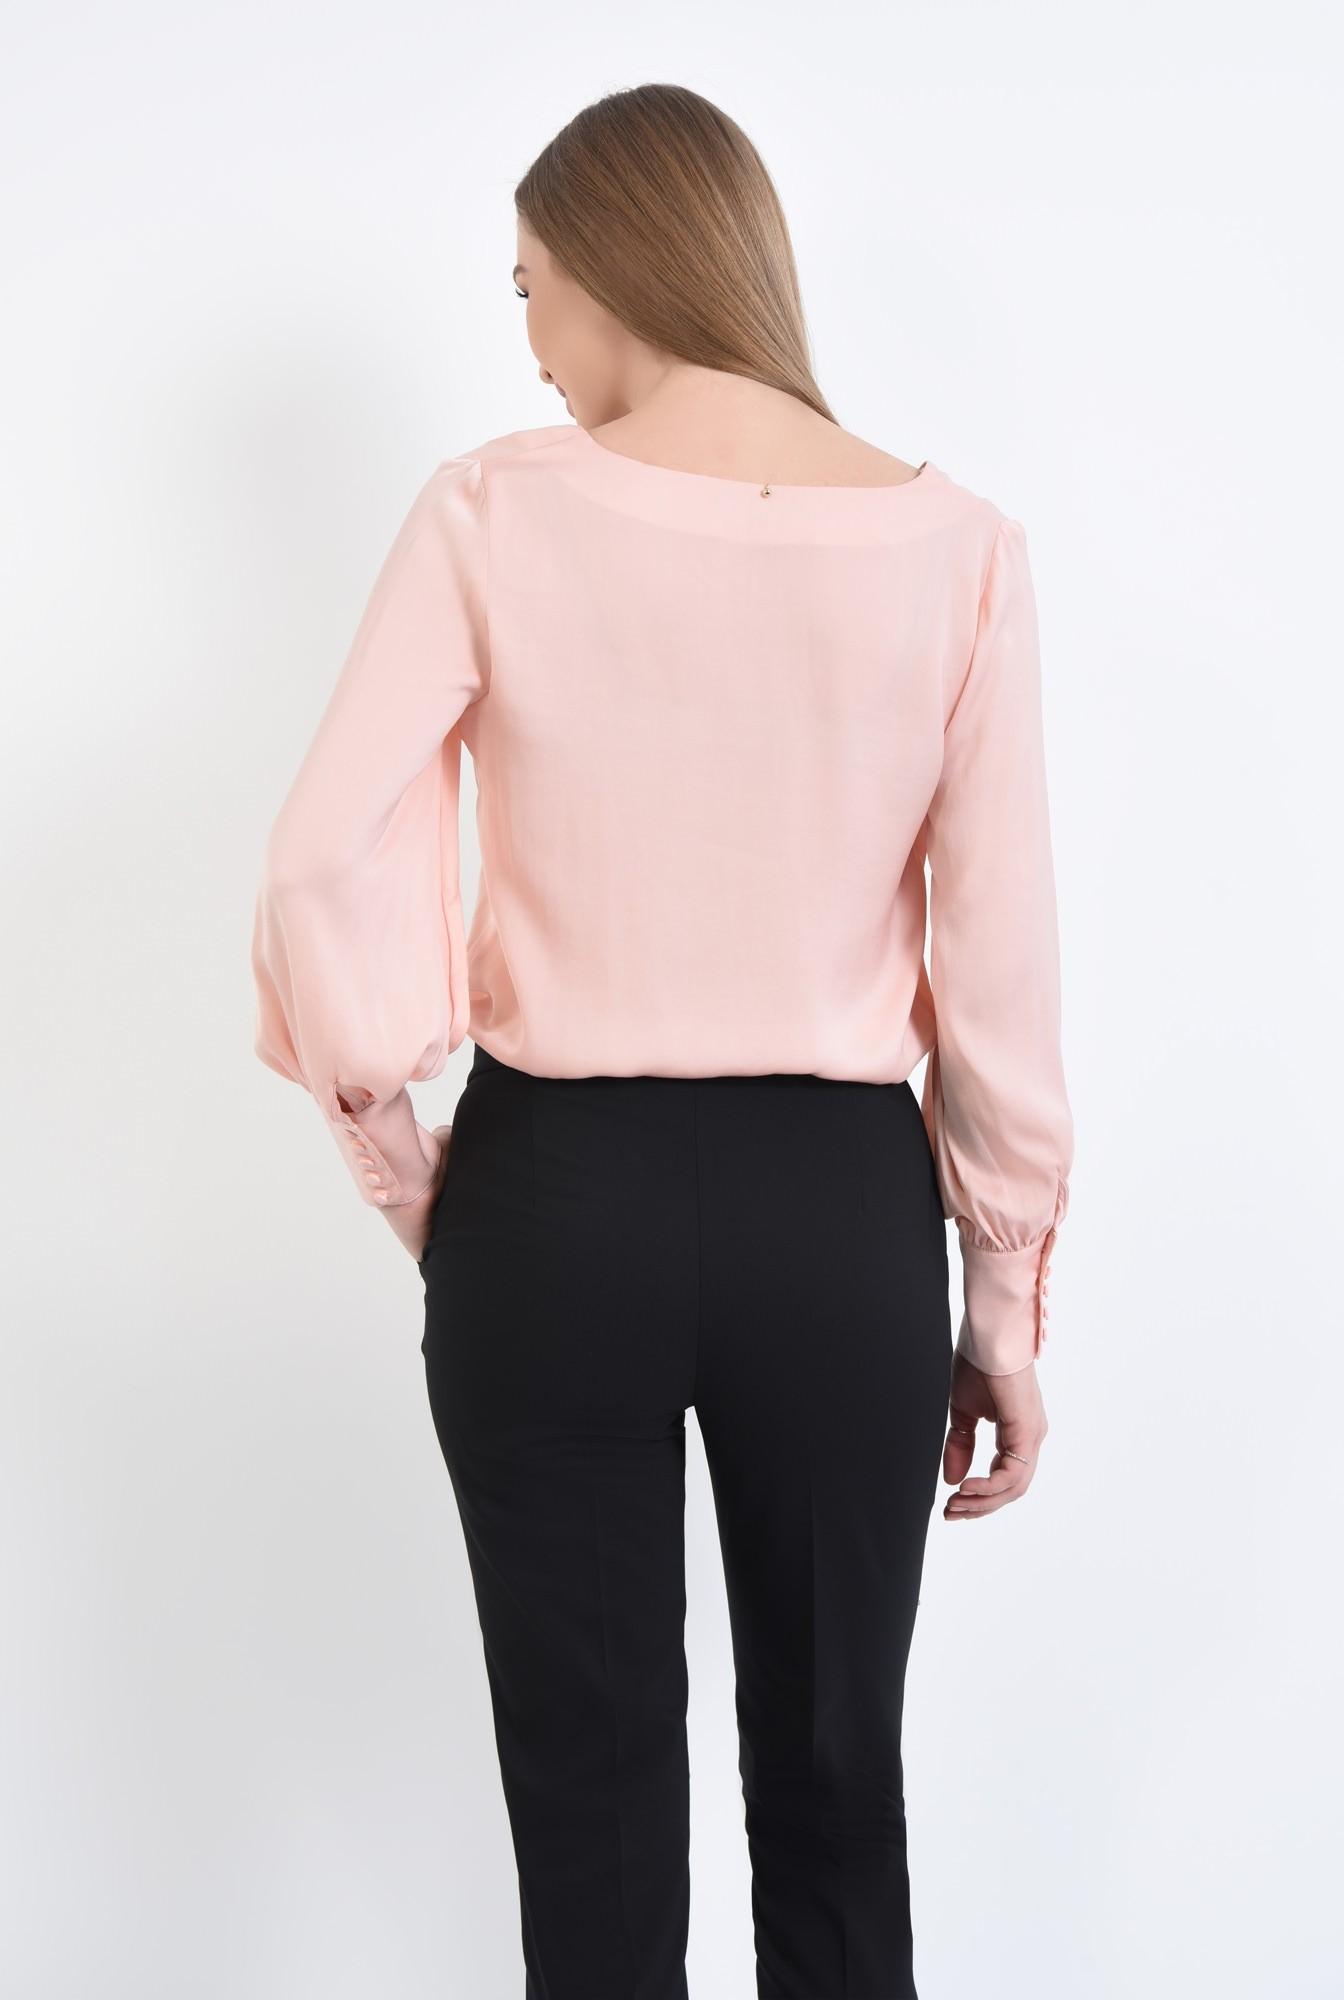 1 - Pantaloni casual, negru, bumbac